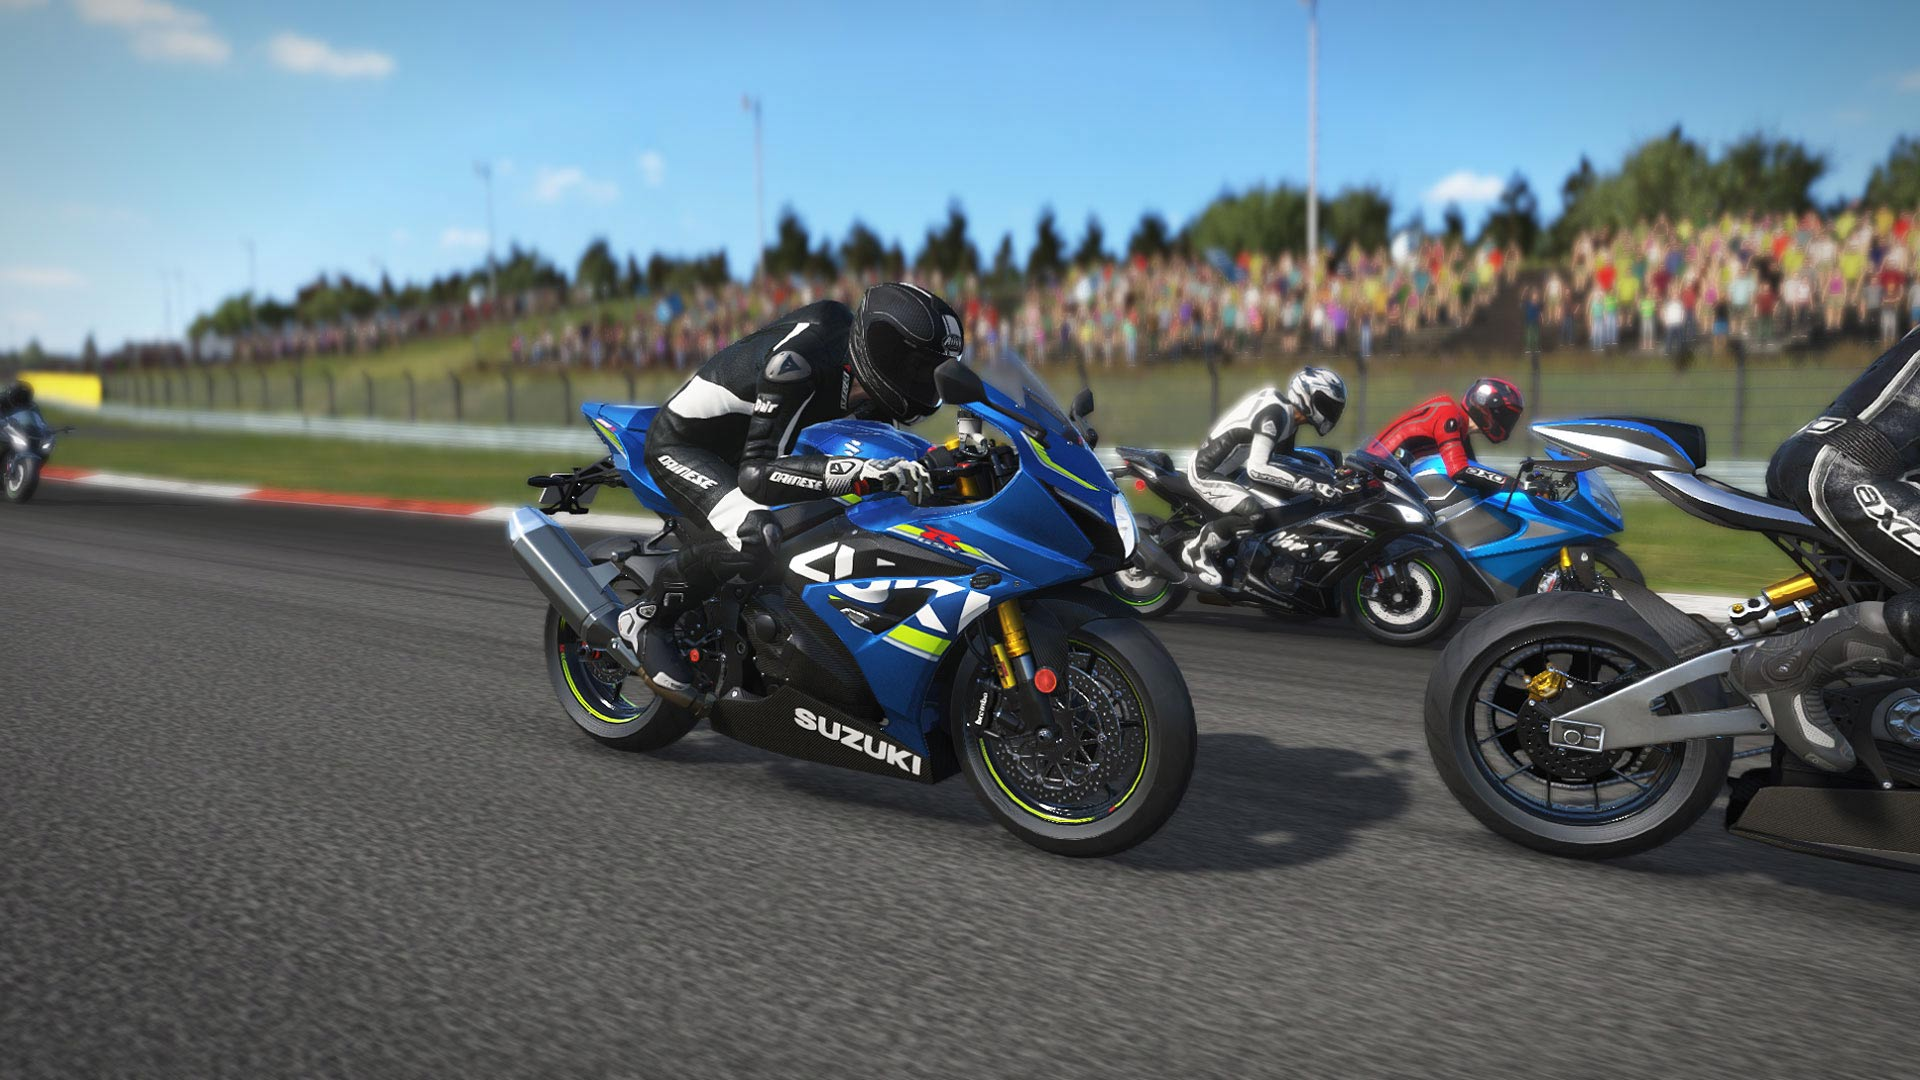 Ride 2 Surprise Dlc Available Inside Sim Racing